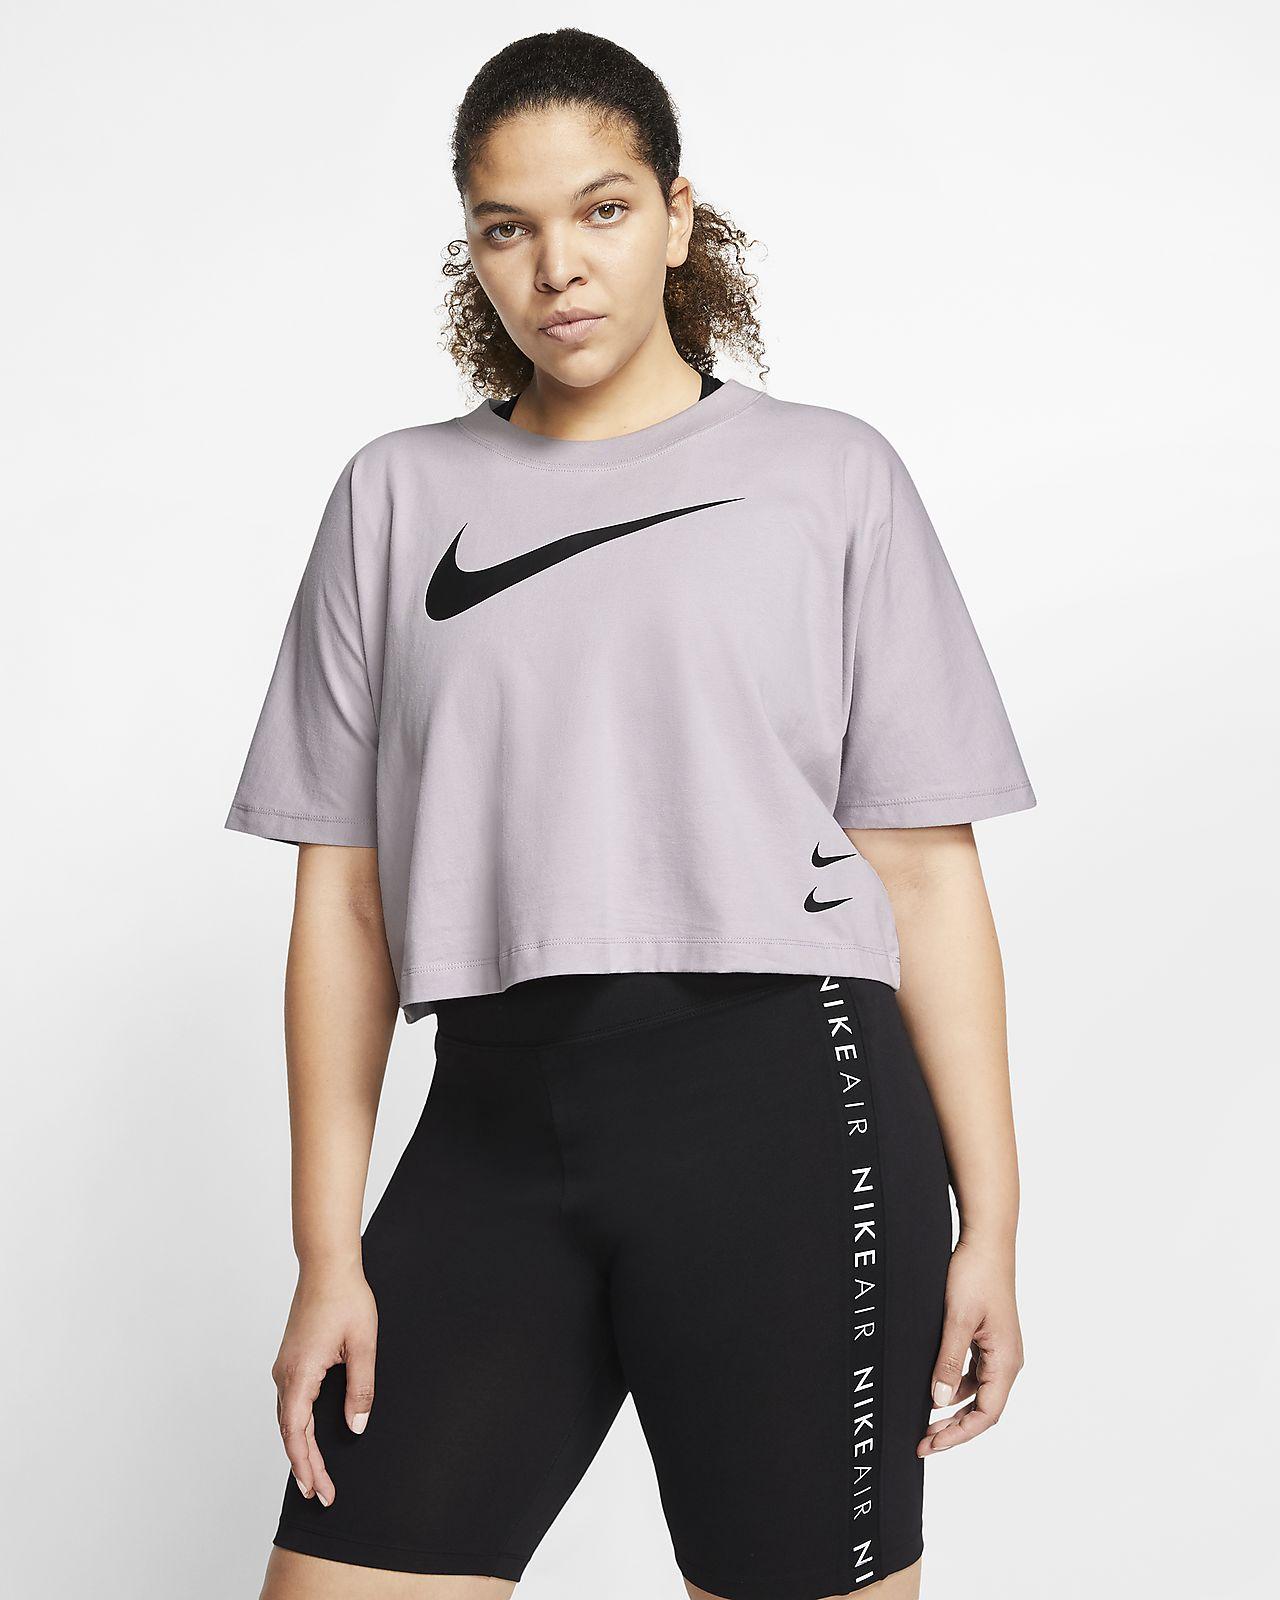 Nike Sportswear Swoosh Kurzarmoberteil für Damen (große Größe)